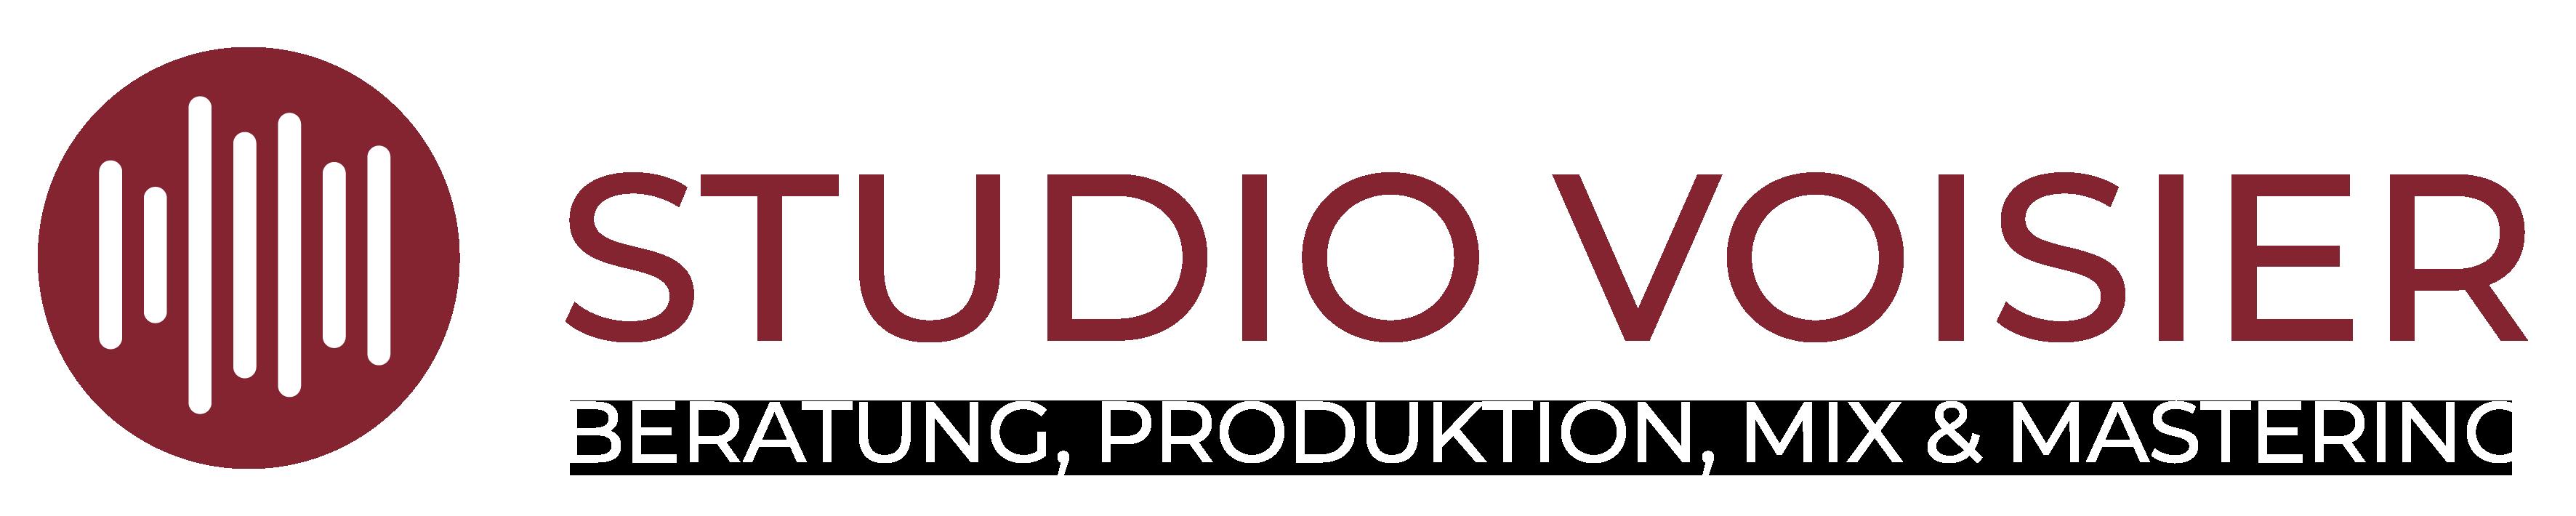 Logo Studio Voisier Beschreibung